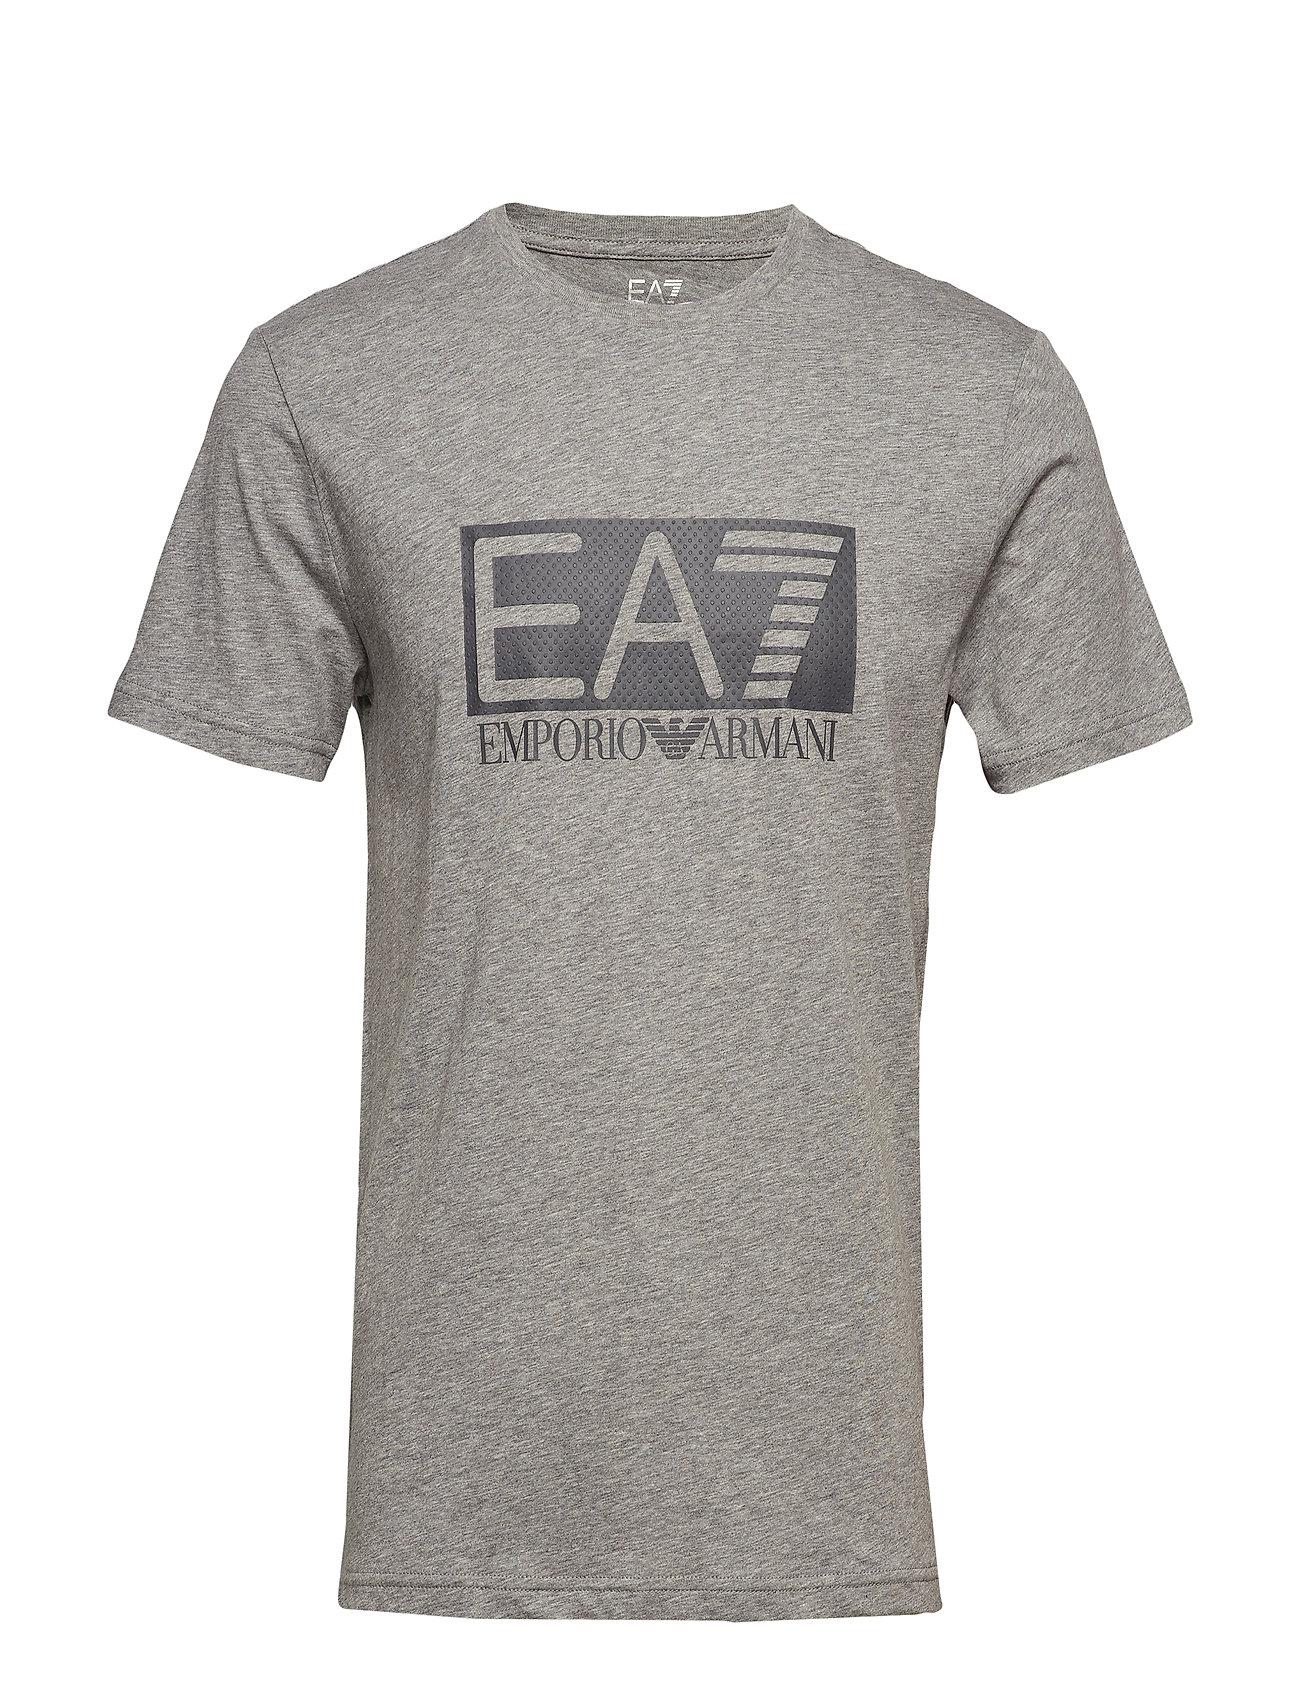 EA7 T-SHIRT - MEDIUM GREY MEL